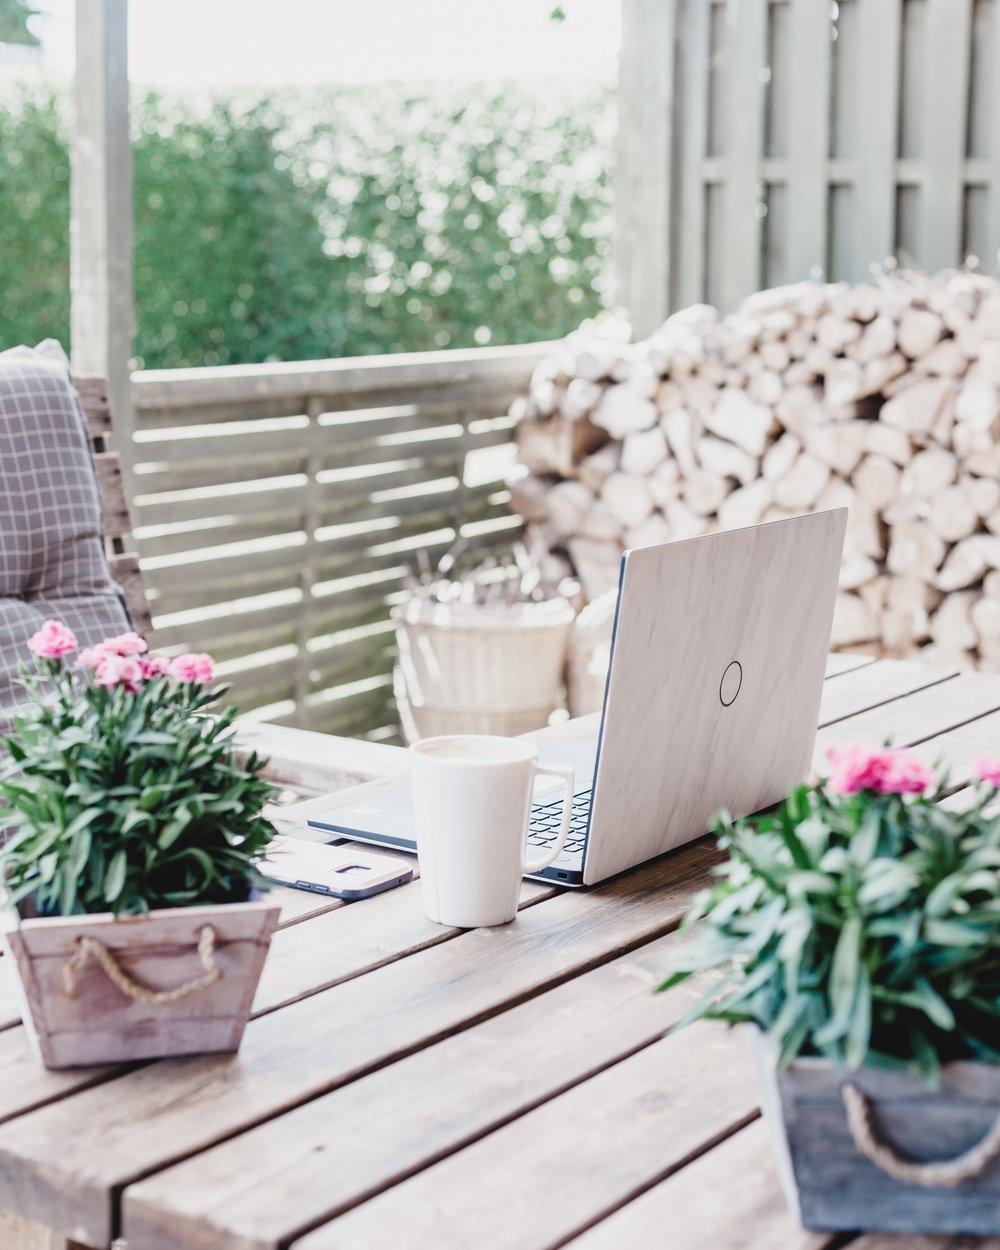 Website Copywriting Services for Creative Entrepreneurs